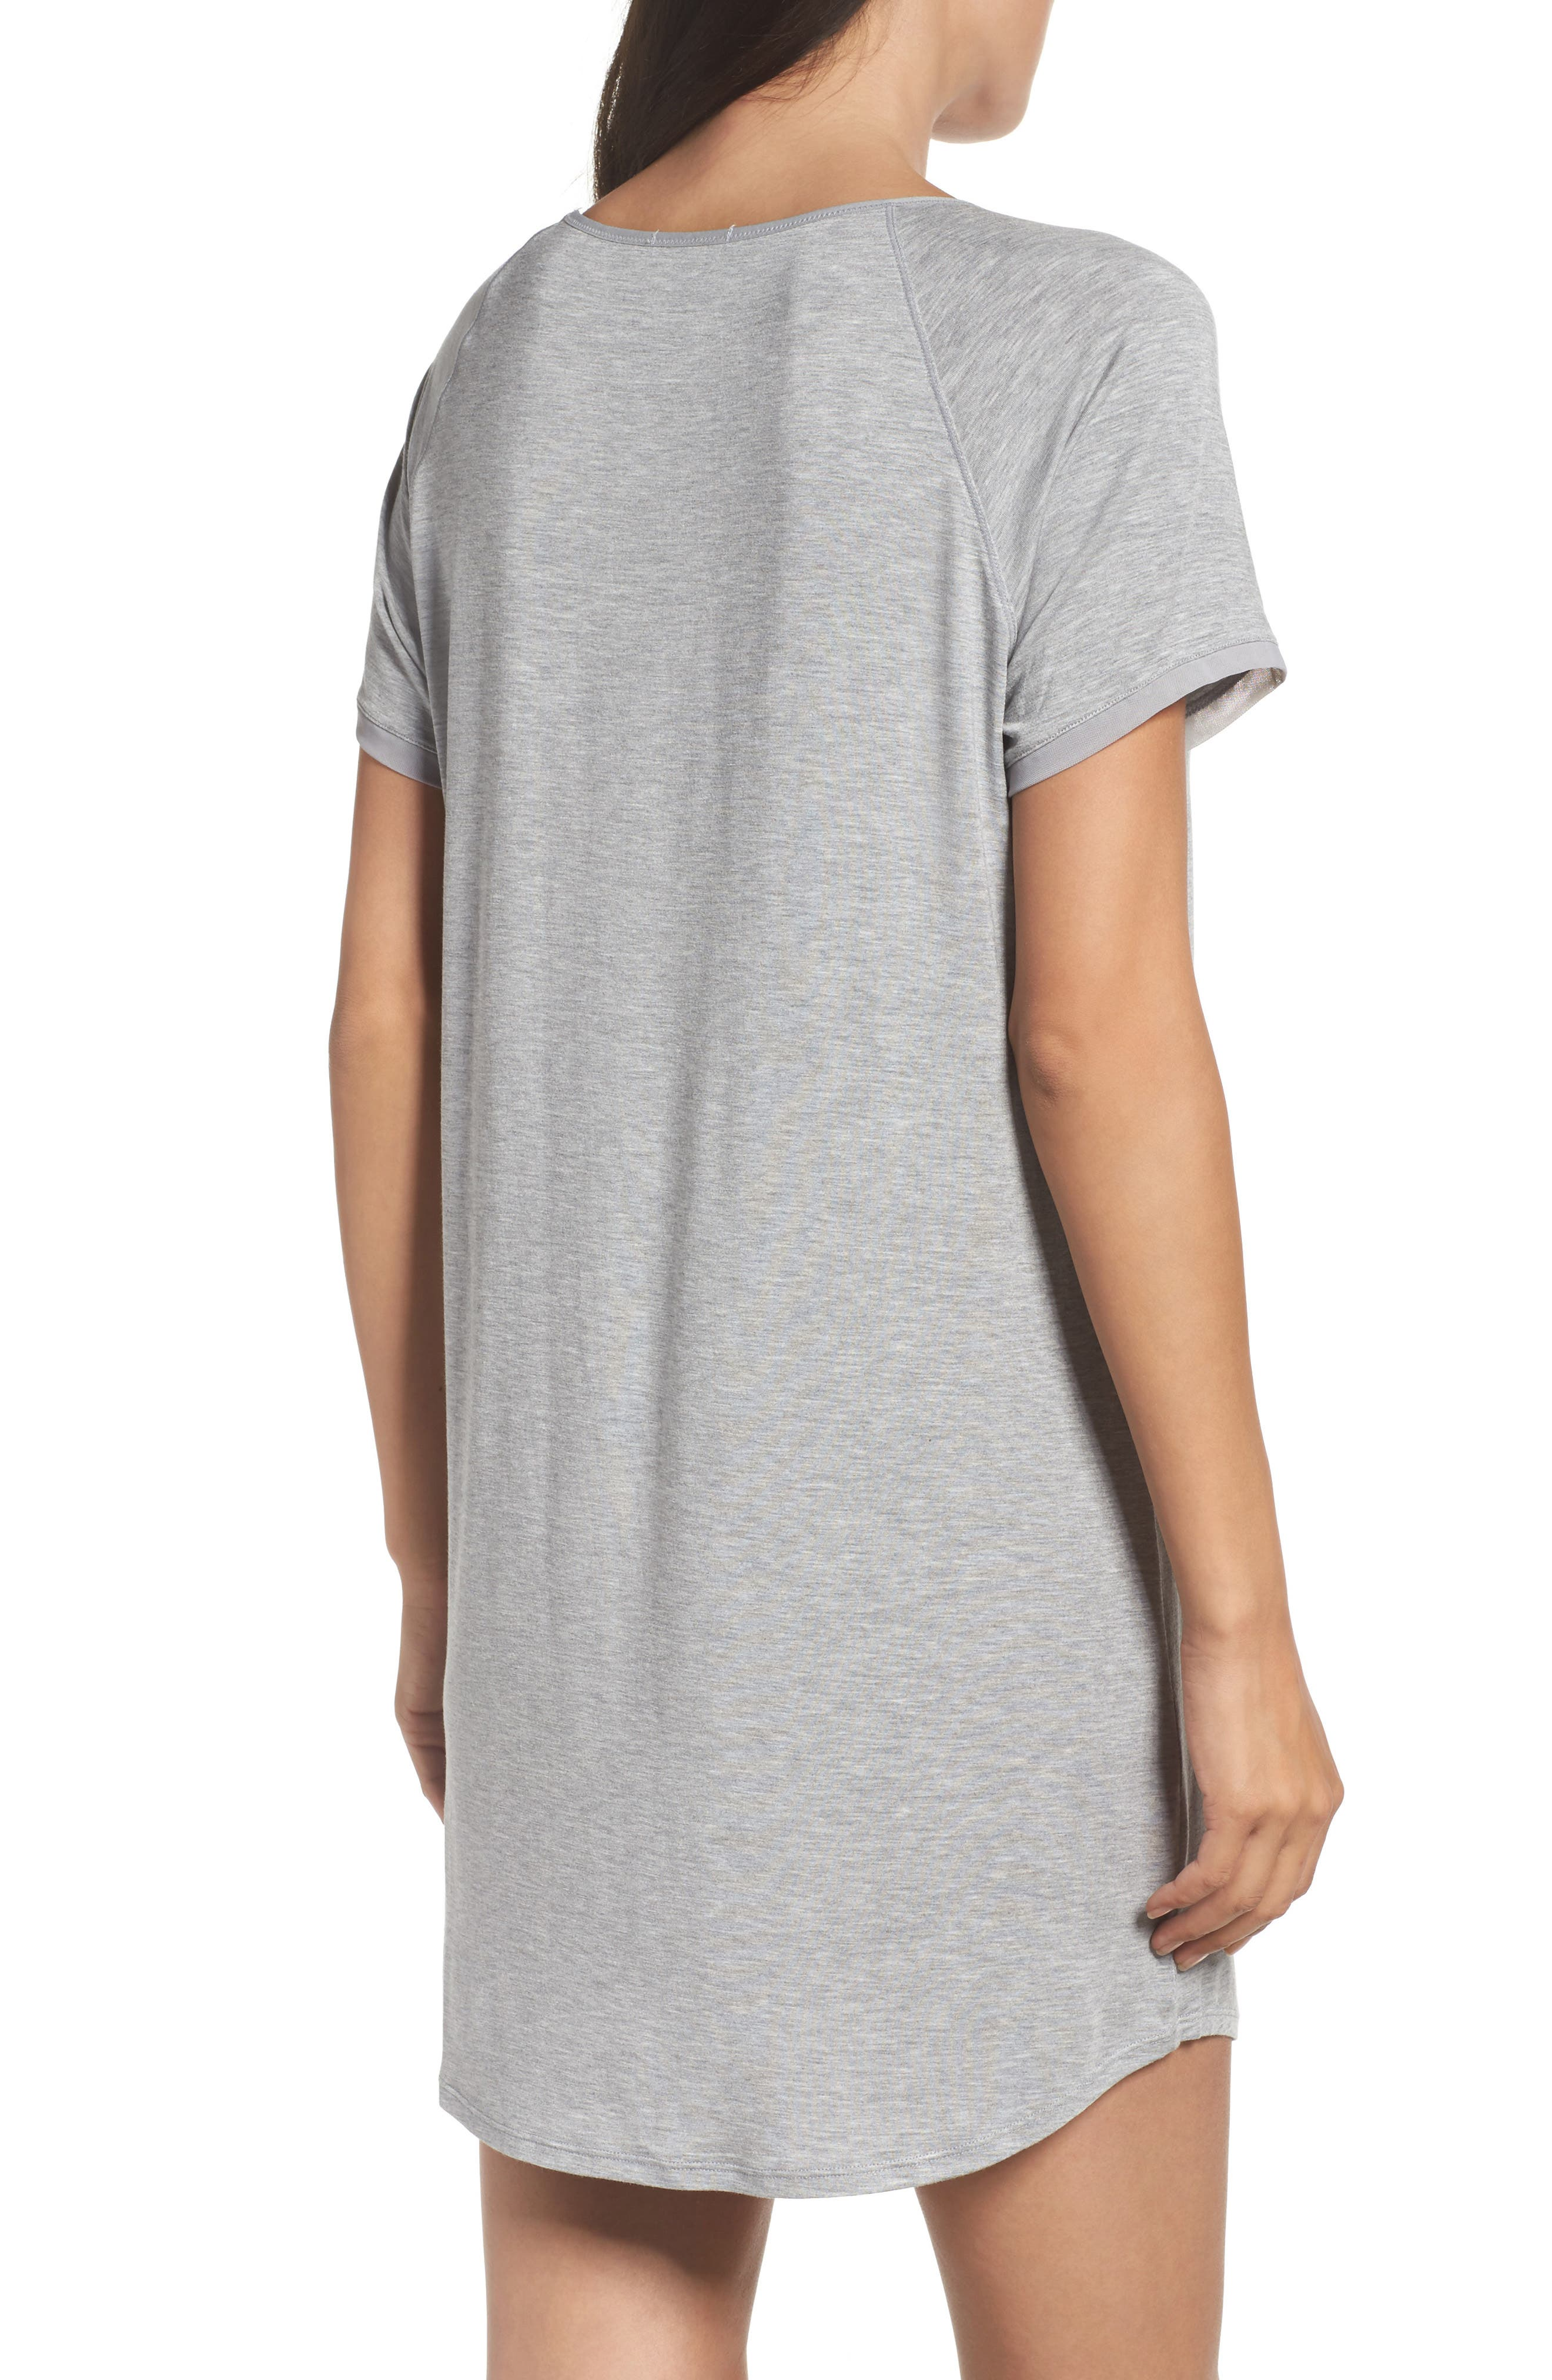 Sleep Shirt,                             Alternate thumbnail 2, color,                             Light Grey Heather